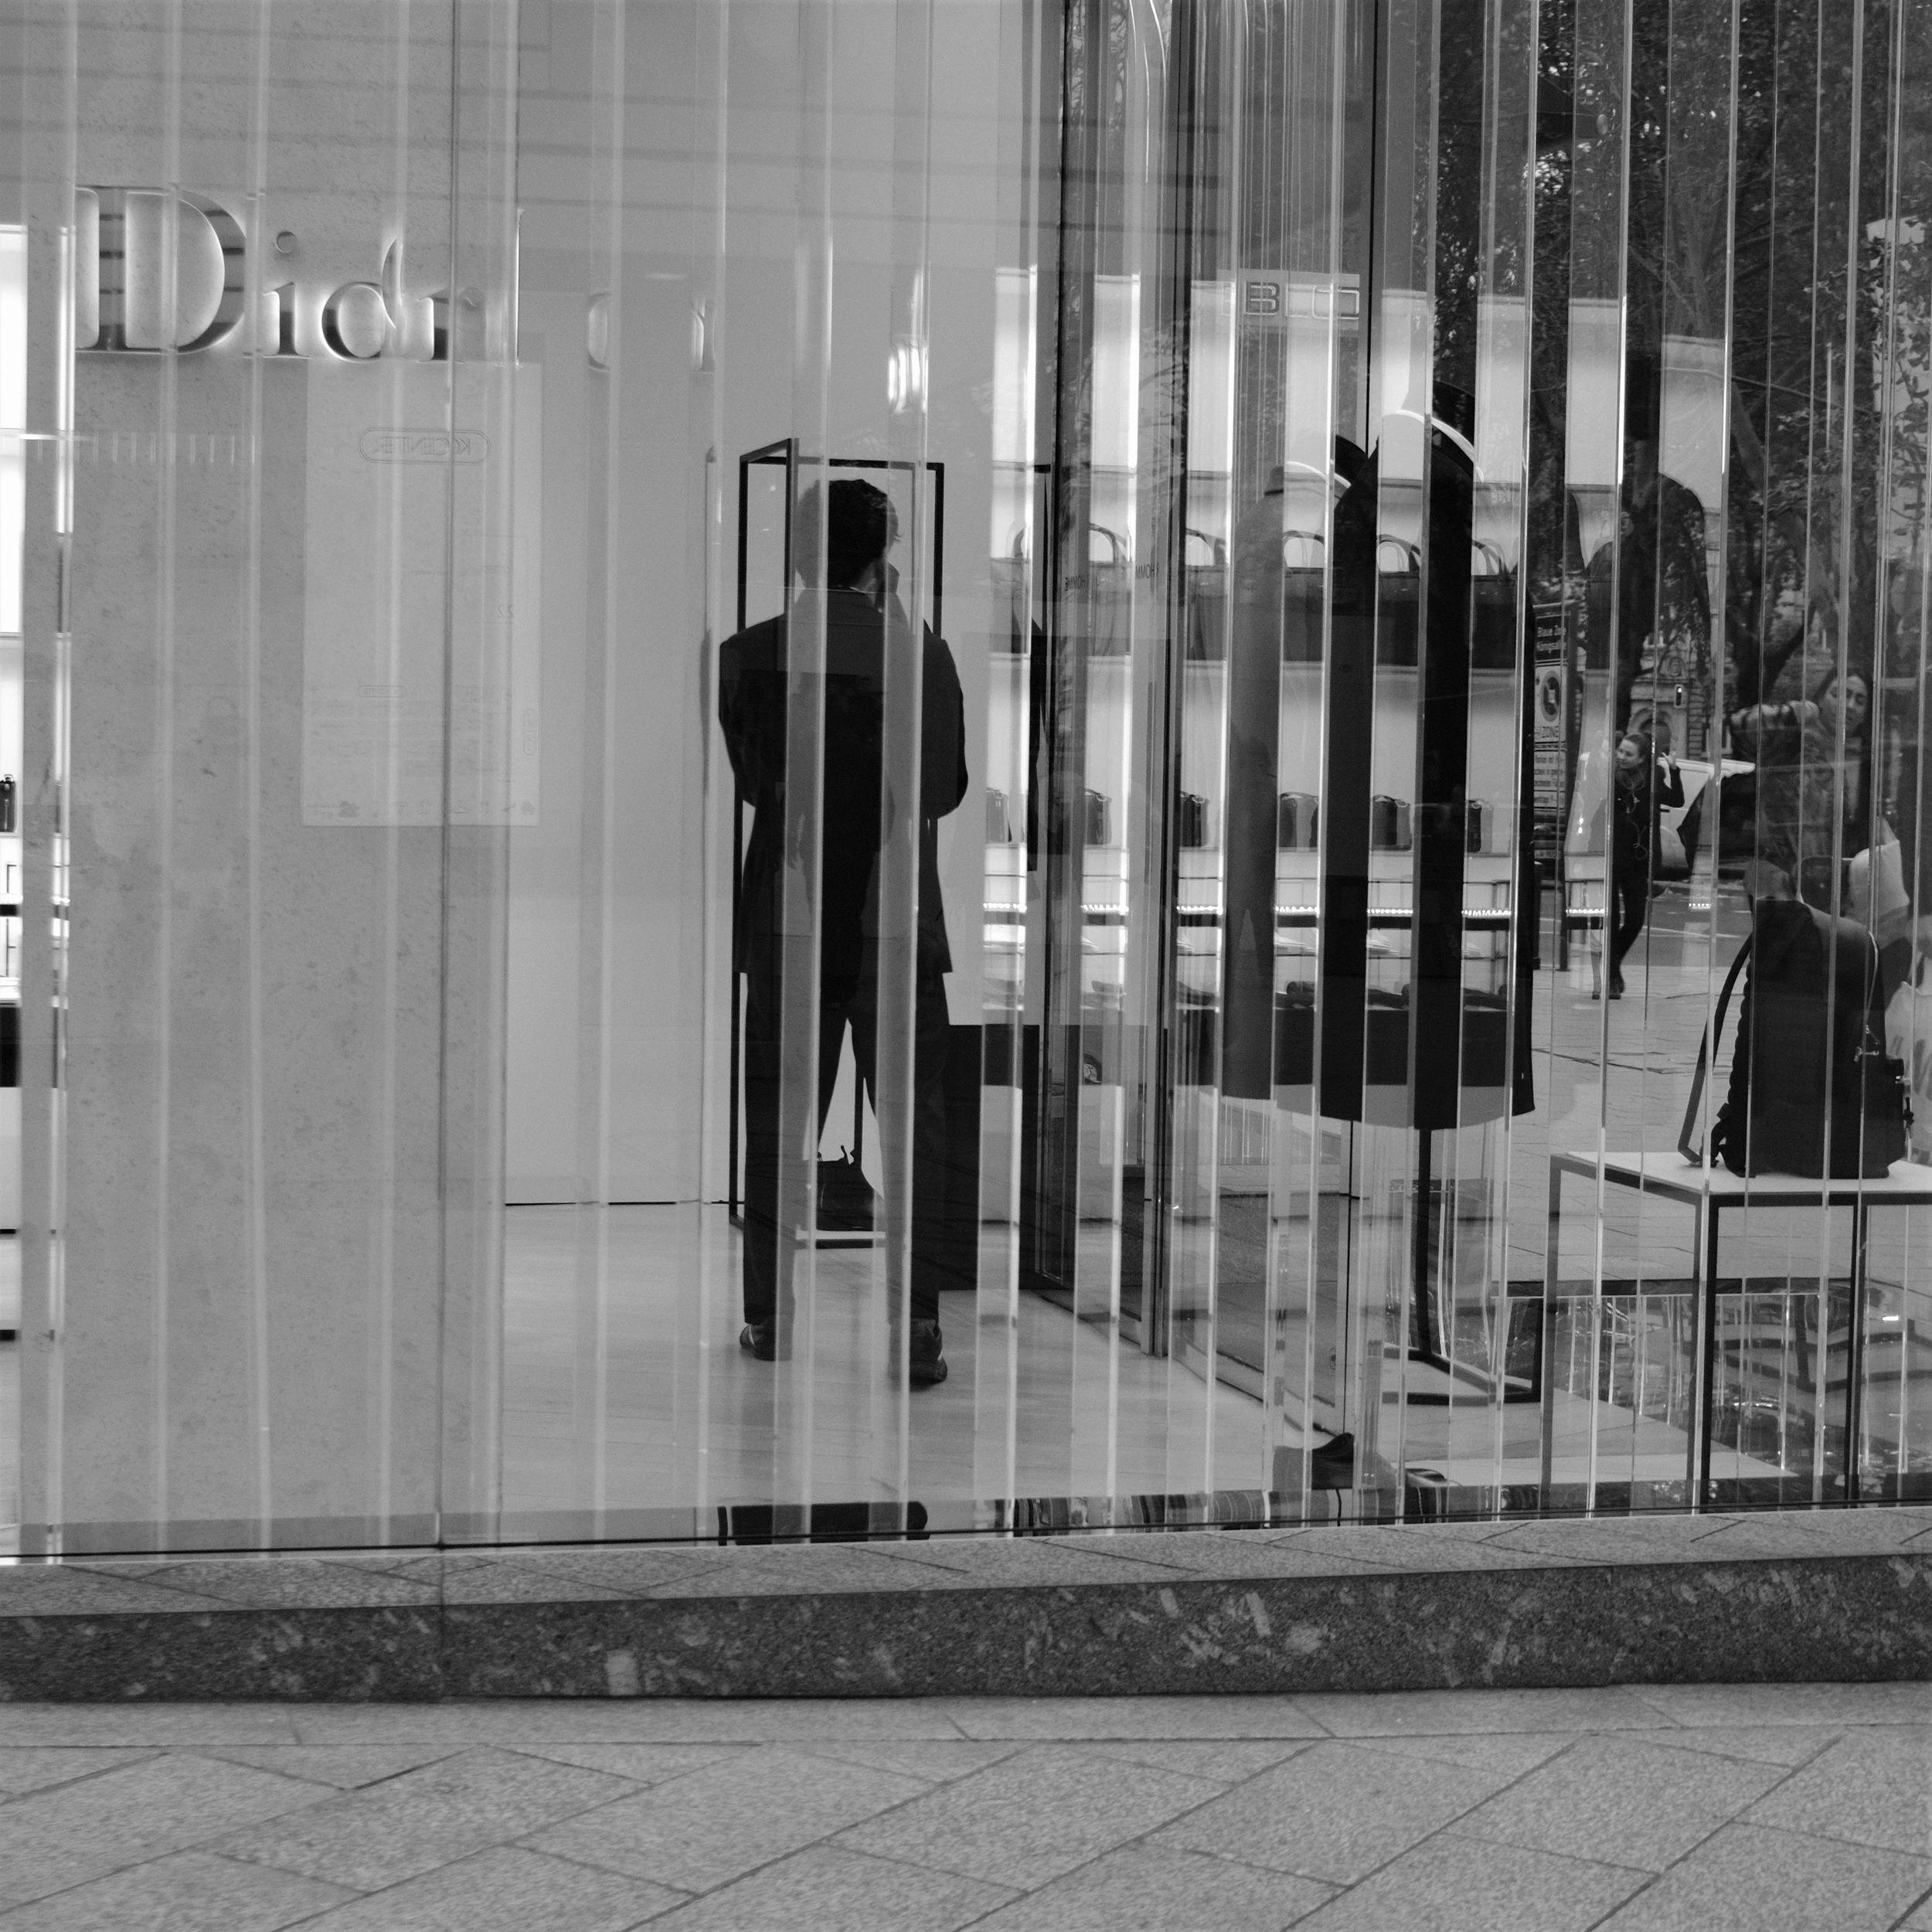 Düsseldorf, Königsallee, Dior